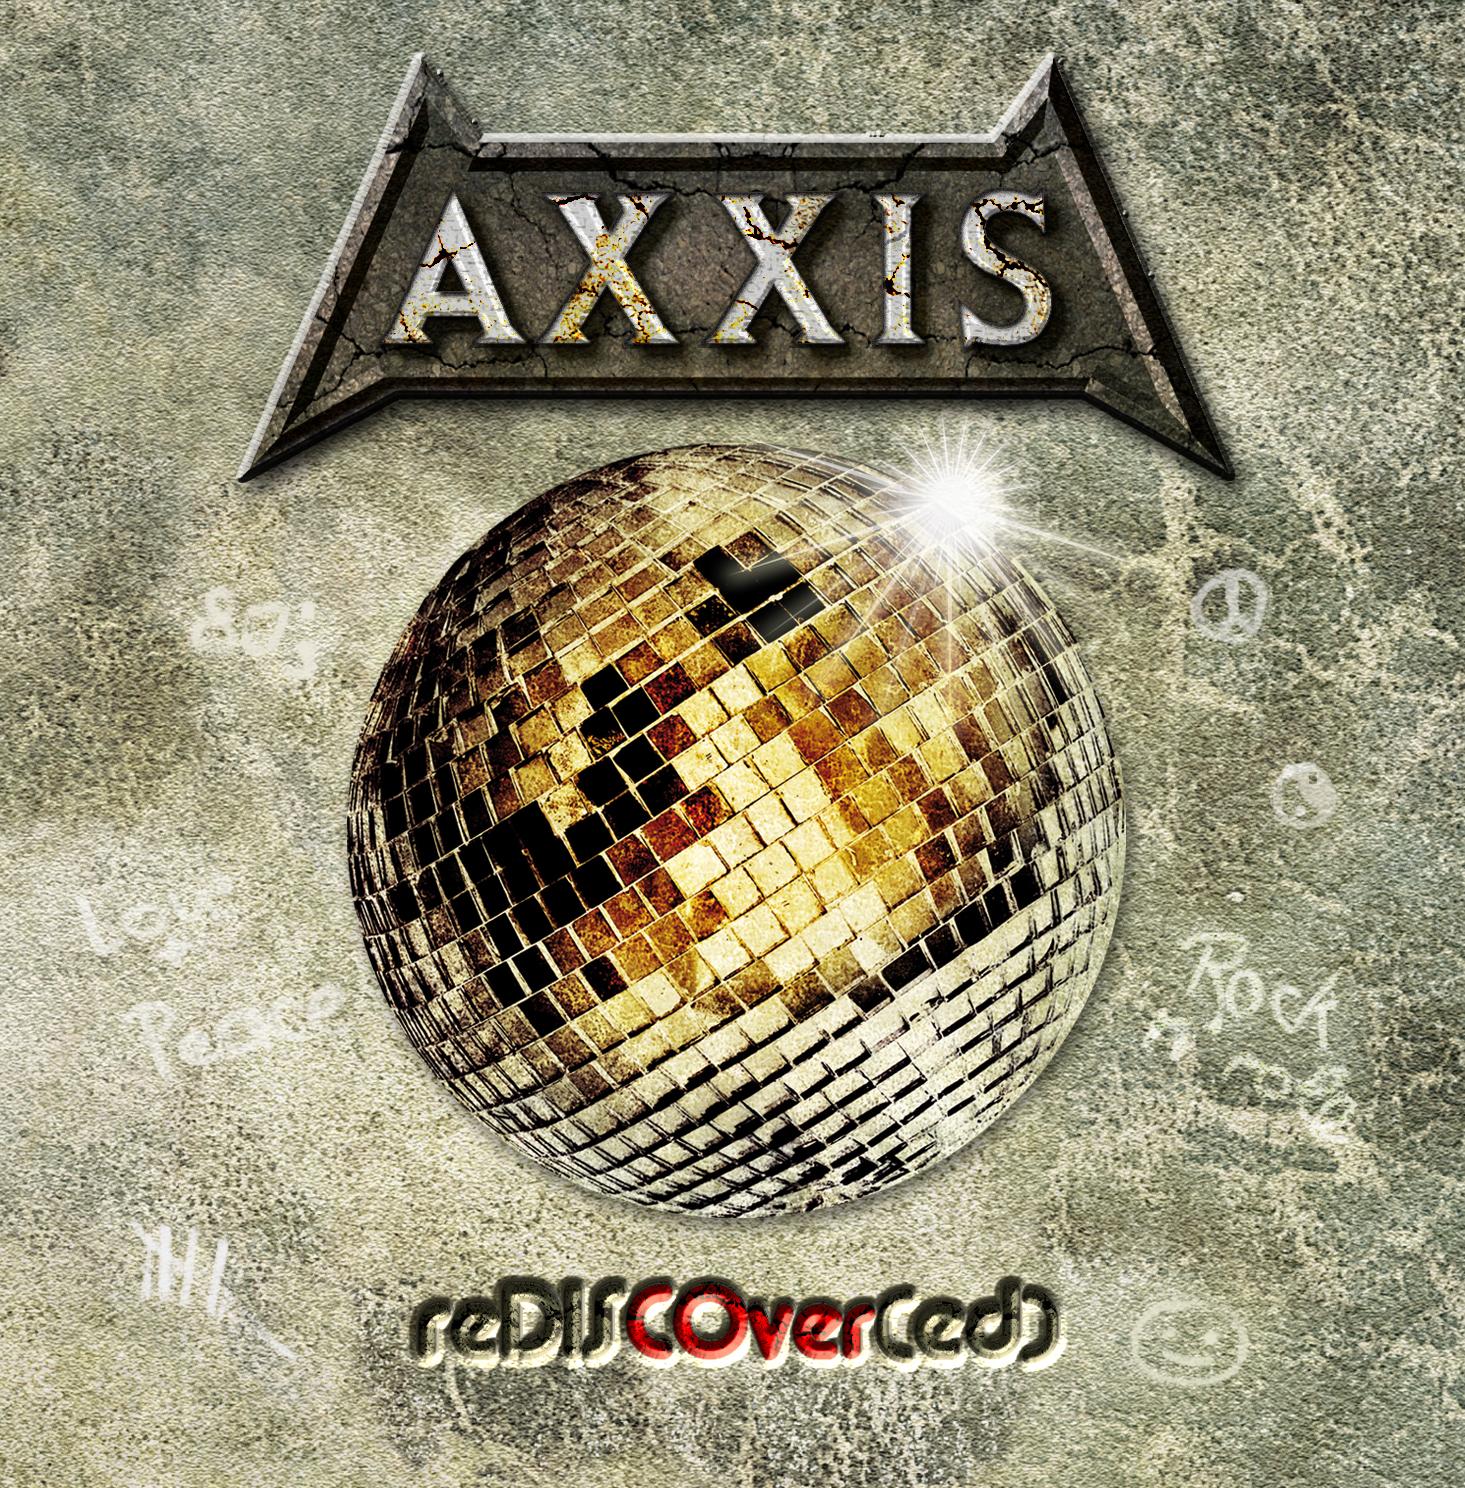 http://2.bp.blogspot.com/-S5XW4_mOSrw/T7ofdrcpJ3I/AAAAAAAAA3s/kXAXUNbOCII/s1600/Axxis_reDISCOvered_COVER.jpg